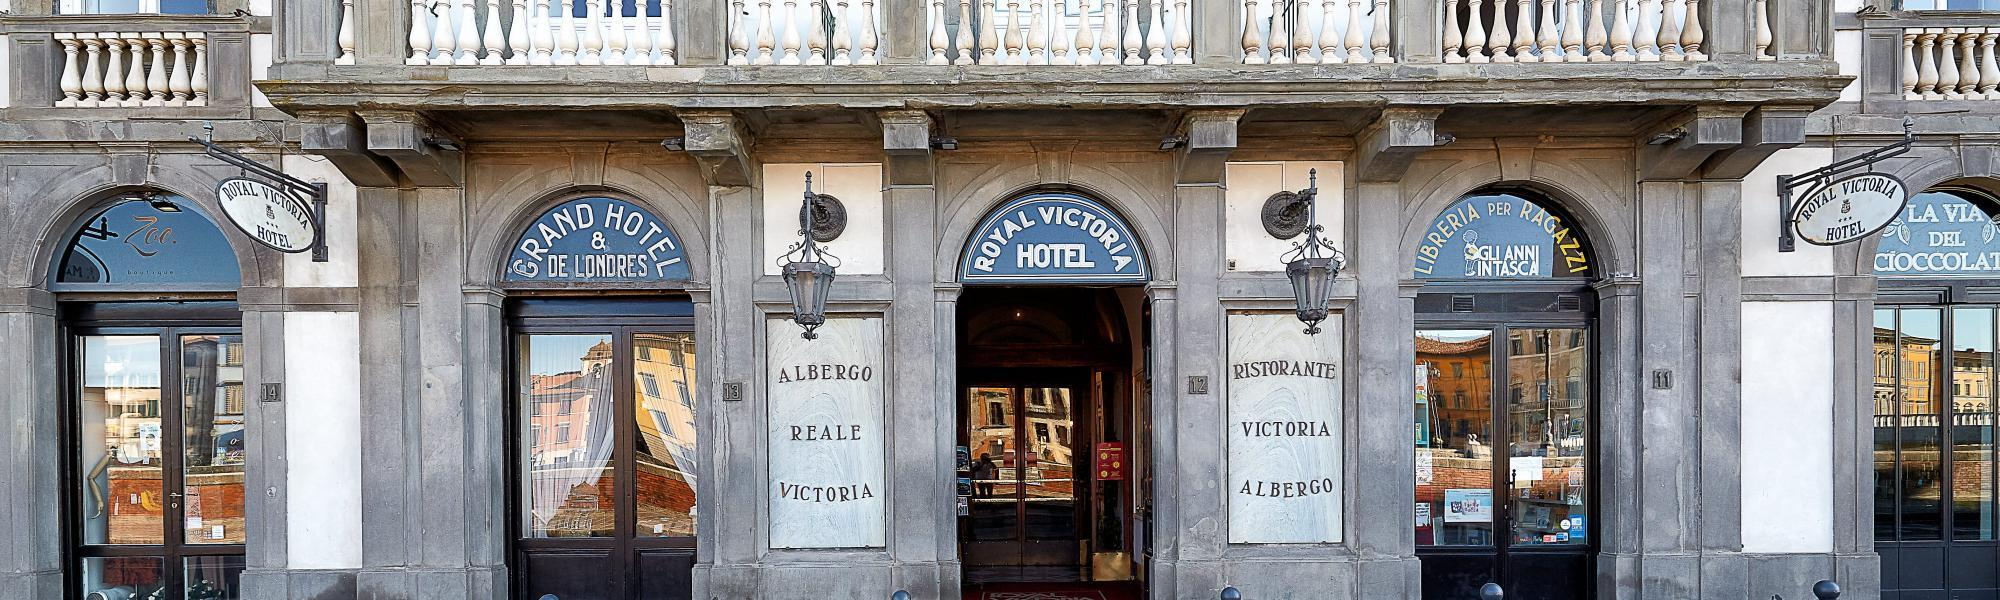 Royal Victoria Hotel, facciata (M. Cerrai, Comune di Pisa)